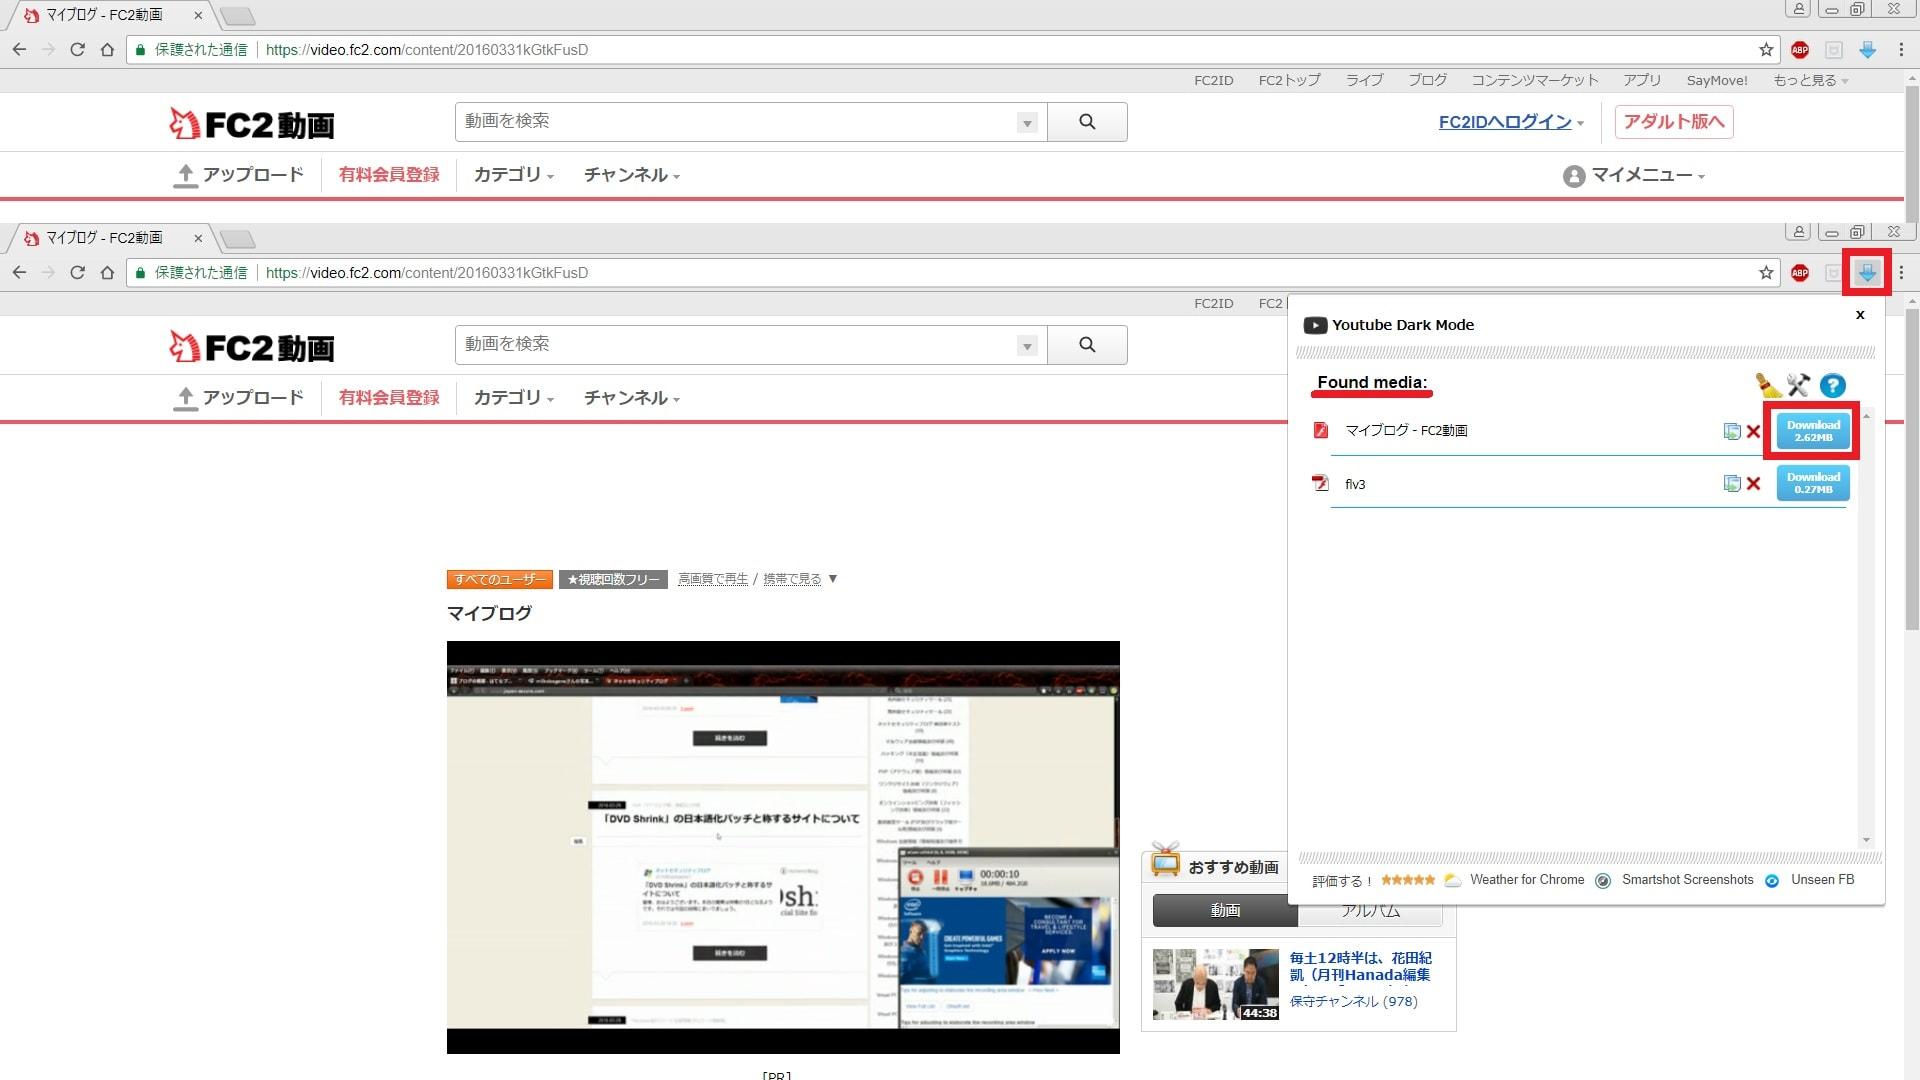 「Flash Video Downloader」のアイコンをクリックして実行画面を表示する